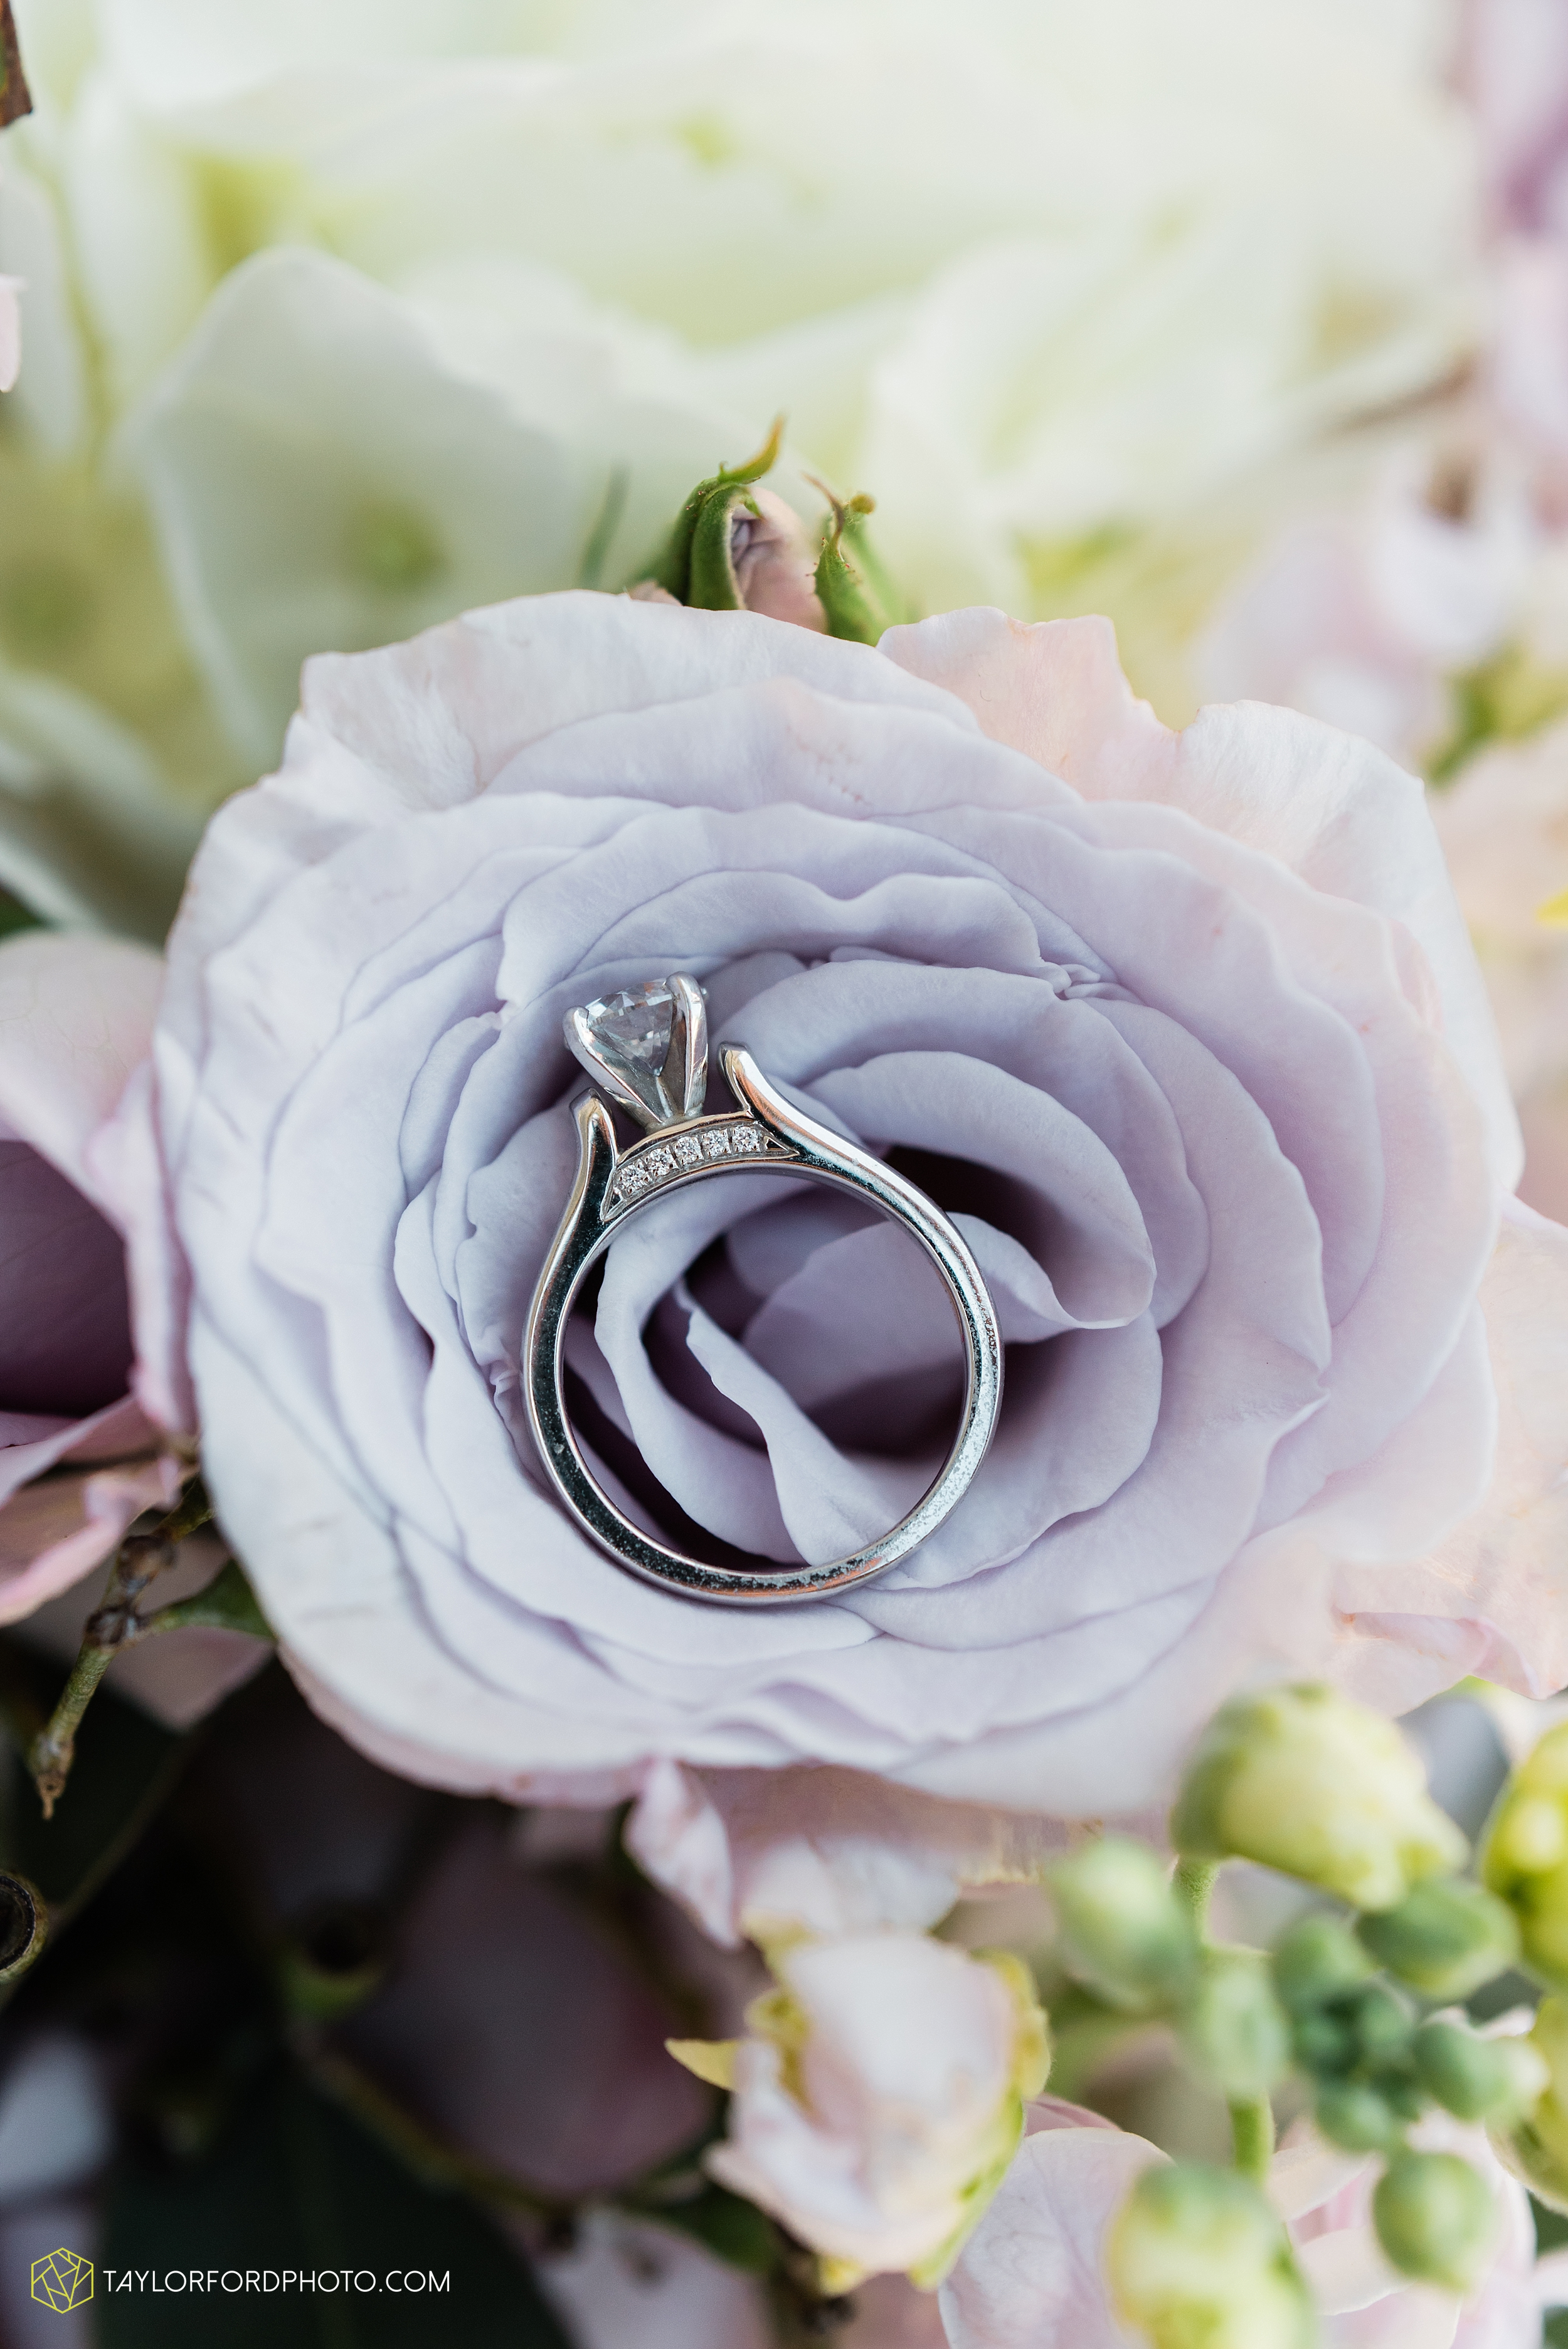 lakeside-rose-gardens-fort-wayne-indiana-elopement-wedding-photographer-Taylor-Ford-Photography_7188.jpg